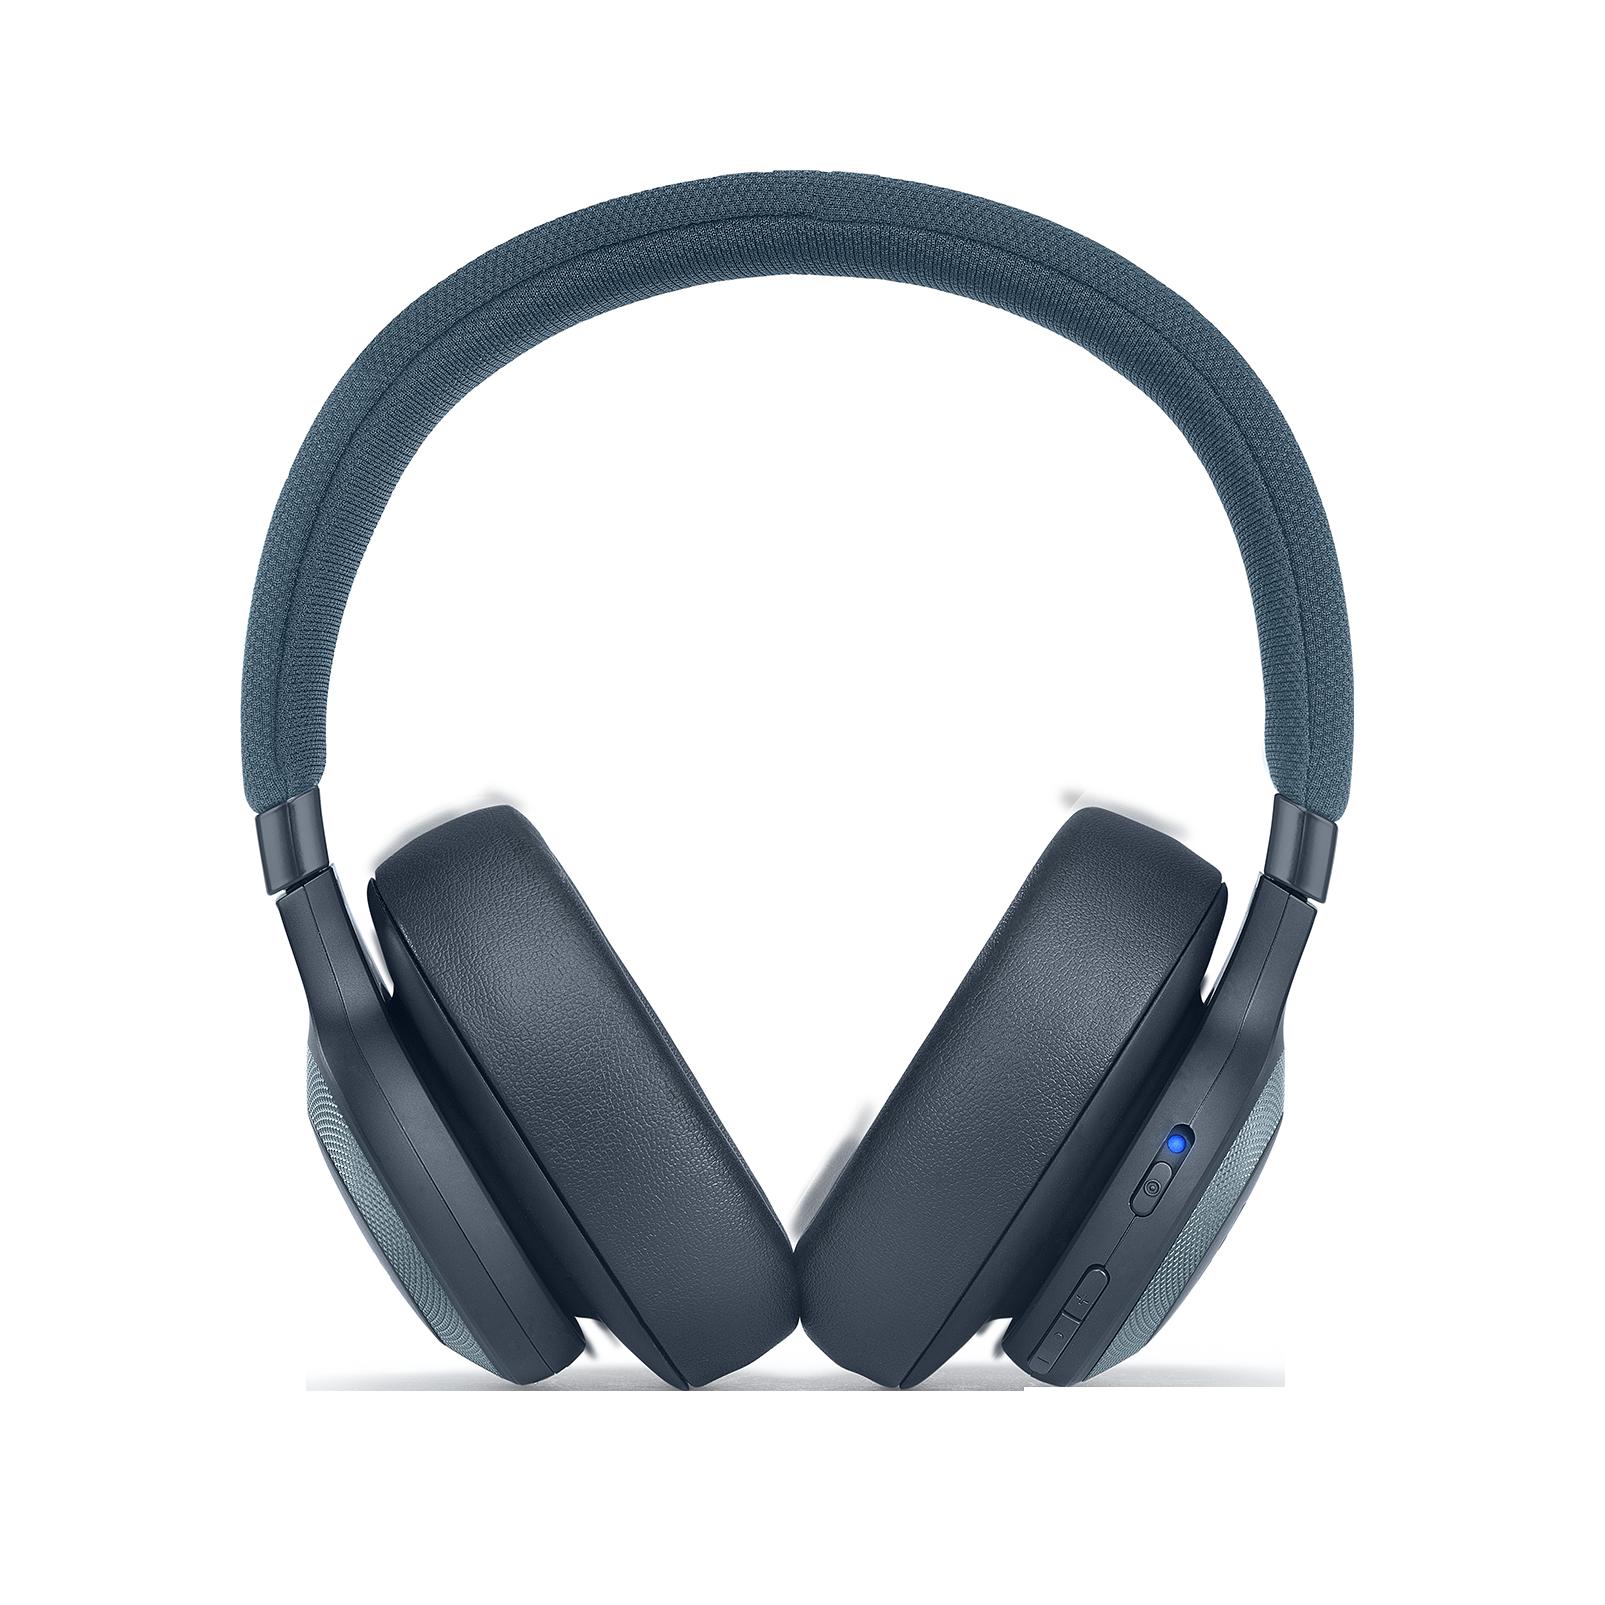 JBL E65BTNC - Blue - Wireless over-ear noise-cancelling headphones - Front